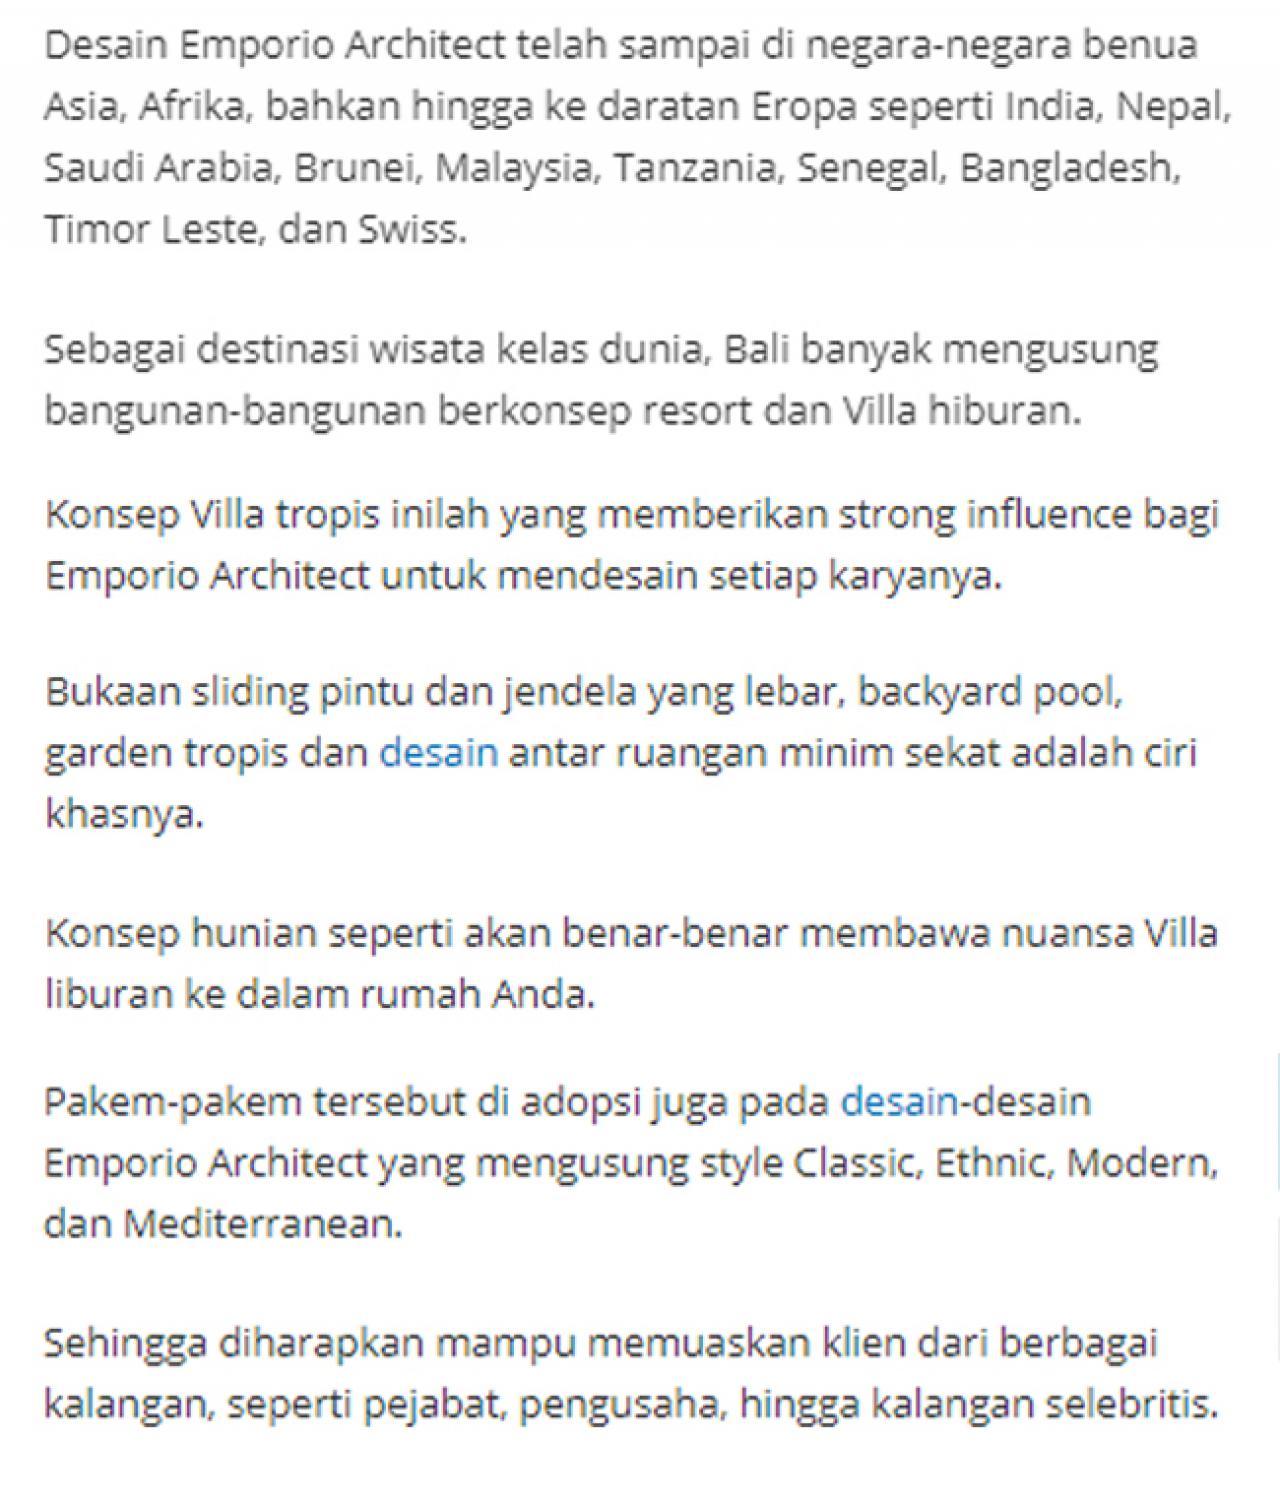 Ulasan Media TribunJakarta.com - Wujudkan Hunian Impian Bersama Emporio Architect, Karya Anak Bangsa yang Sukses Tembus Internasional 4 4